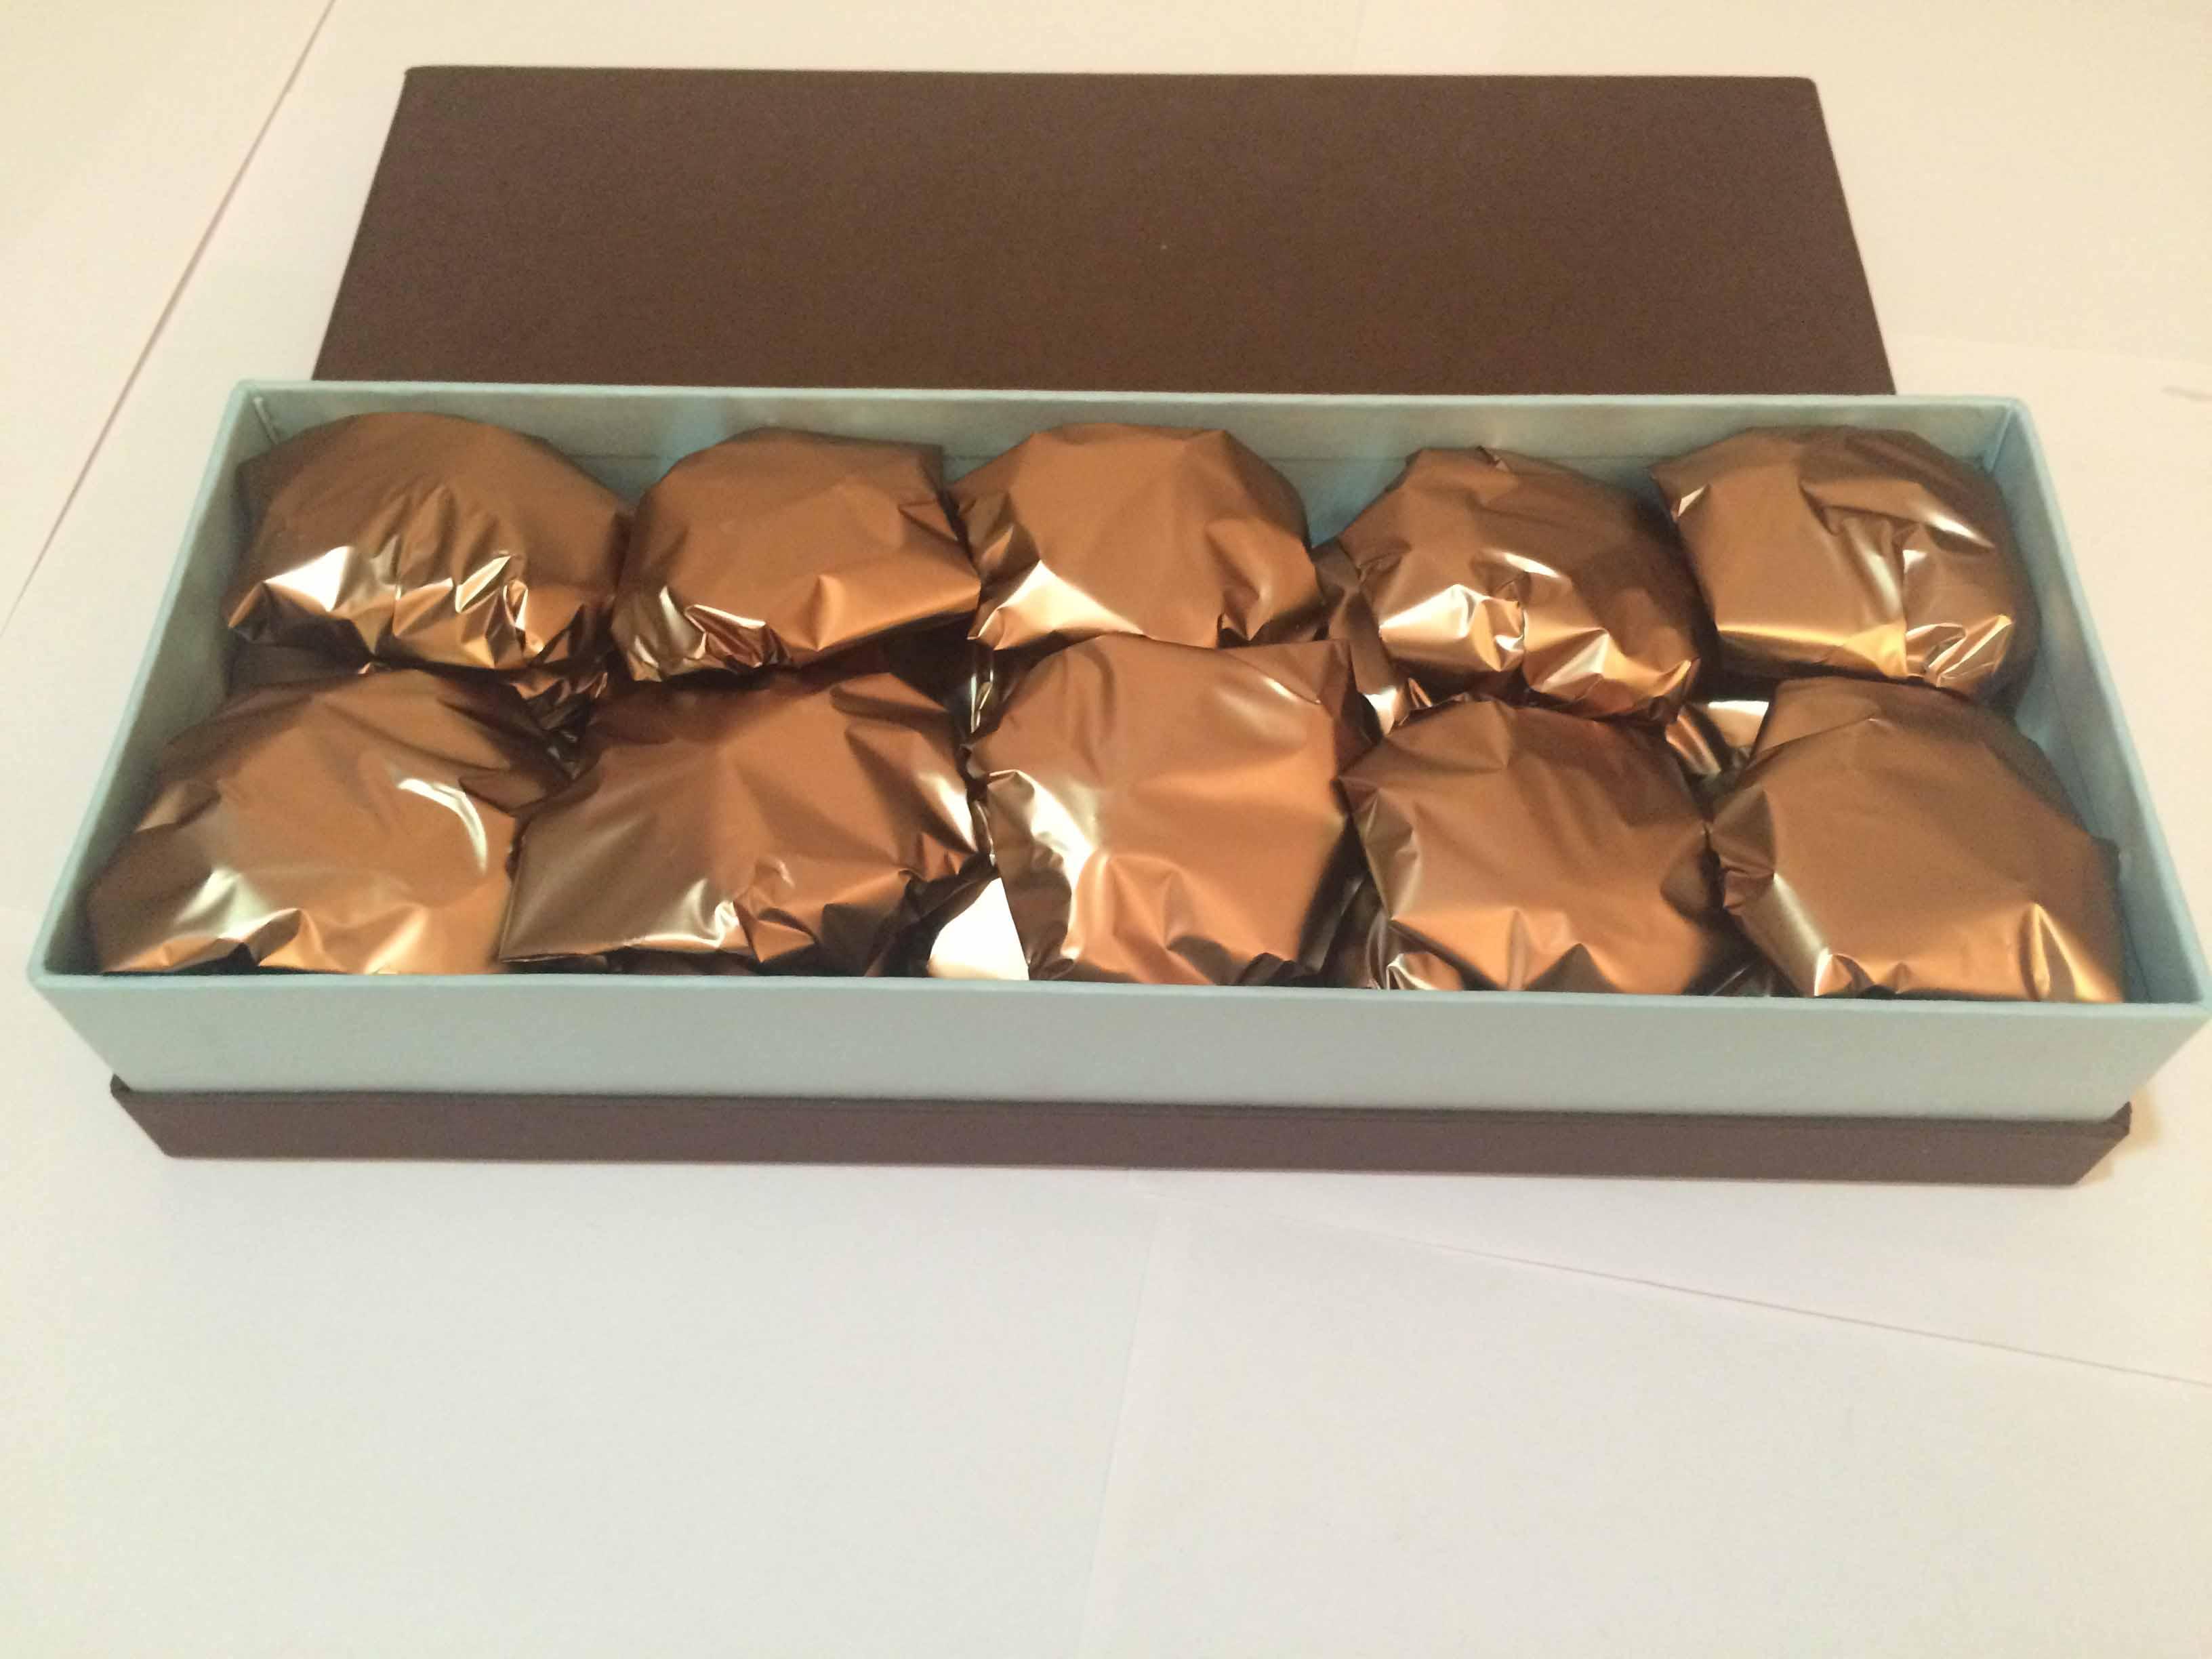 Caramel Crunchies Box of 12pcs of Crunchies